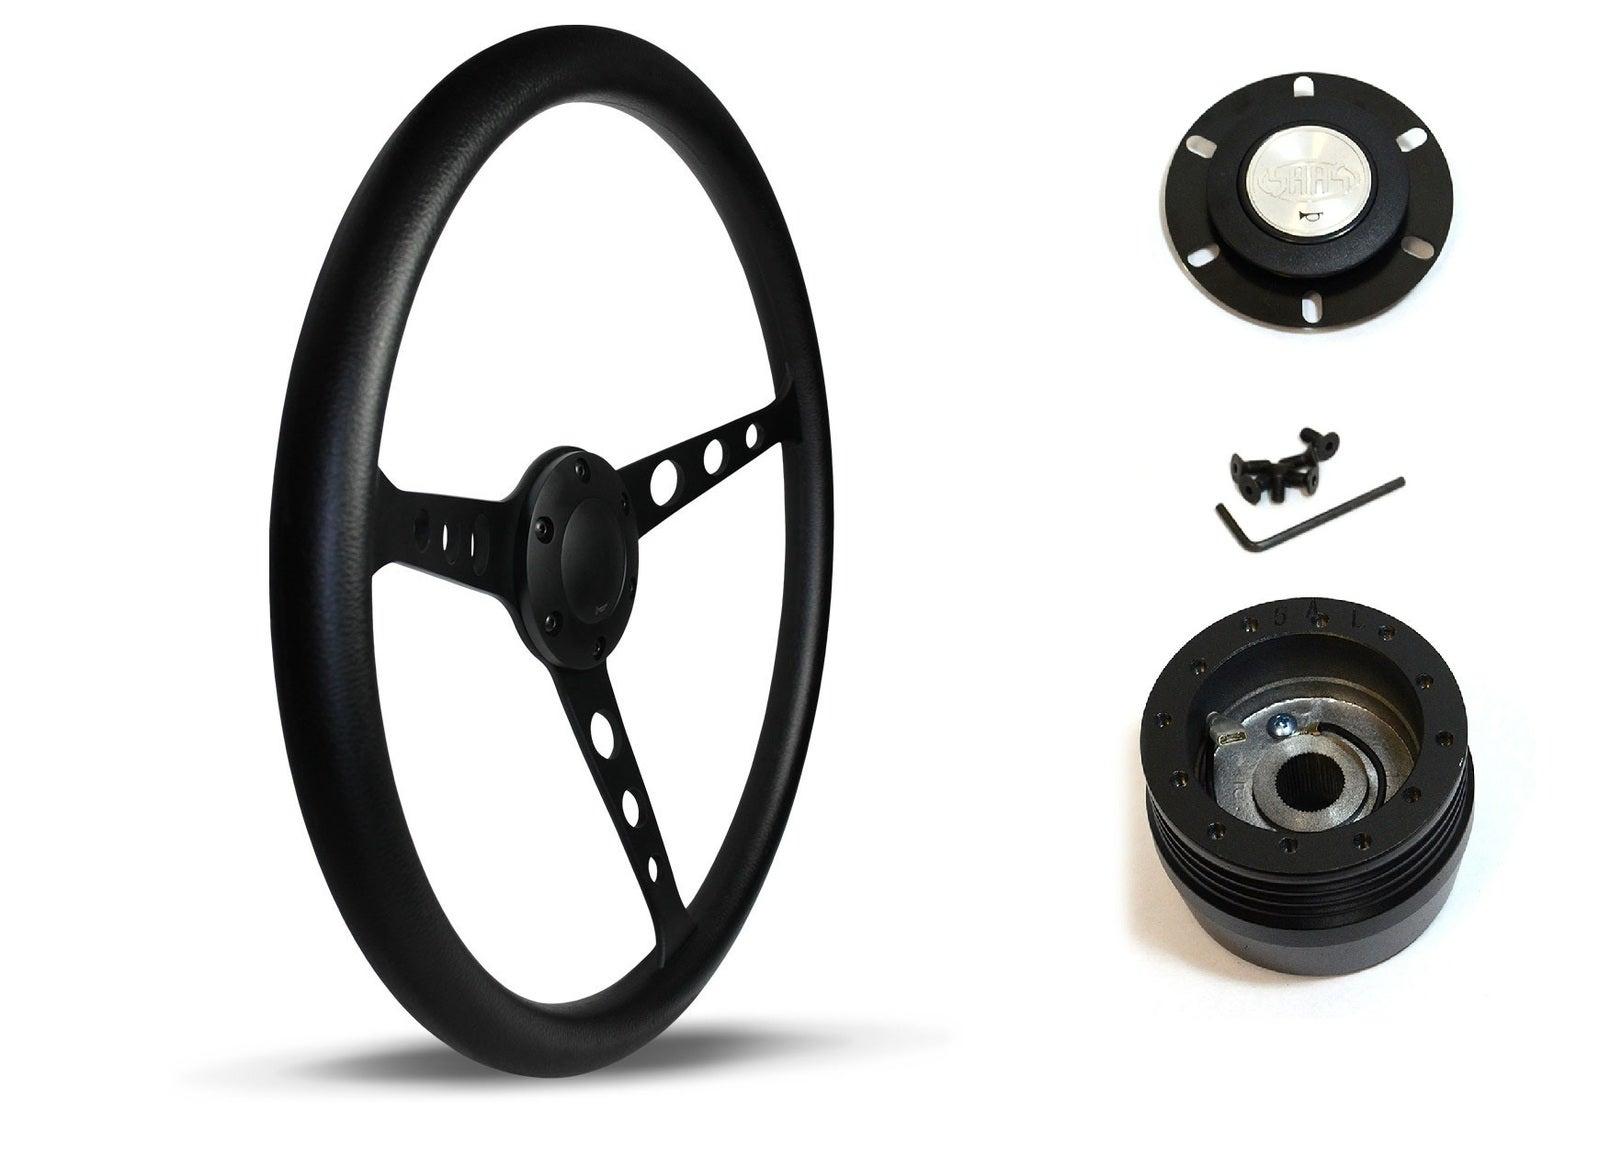 SAAS Steering Wheel SW702PBS & boss for Toyota Celica LT2000 RA23 RA28 RA40 RA60